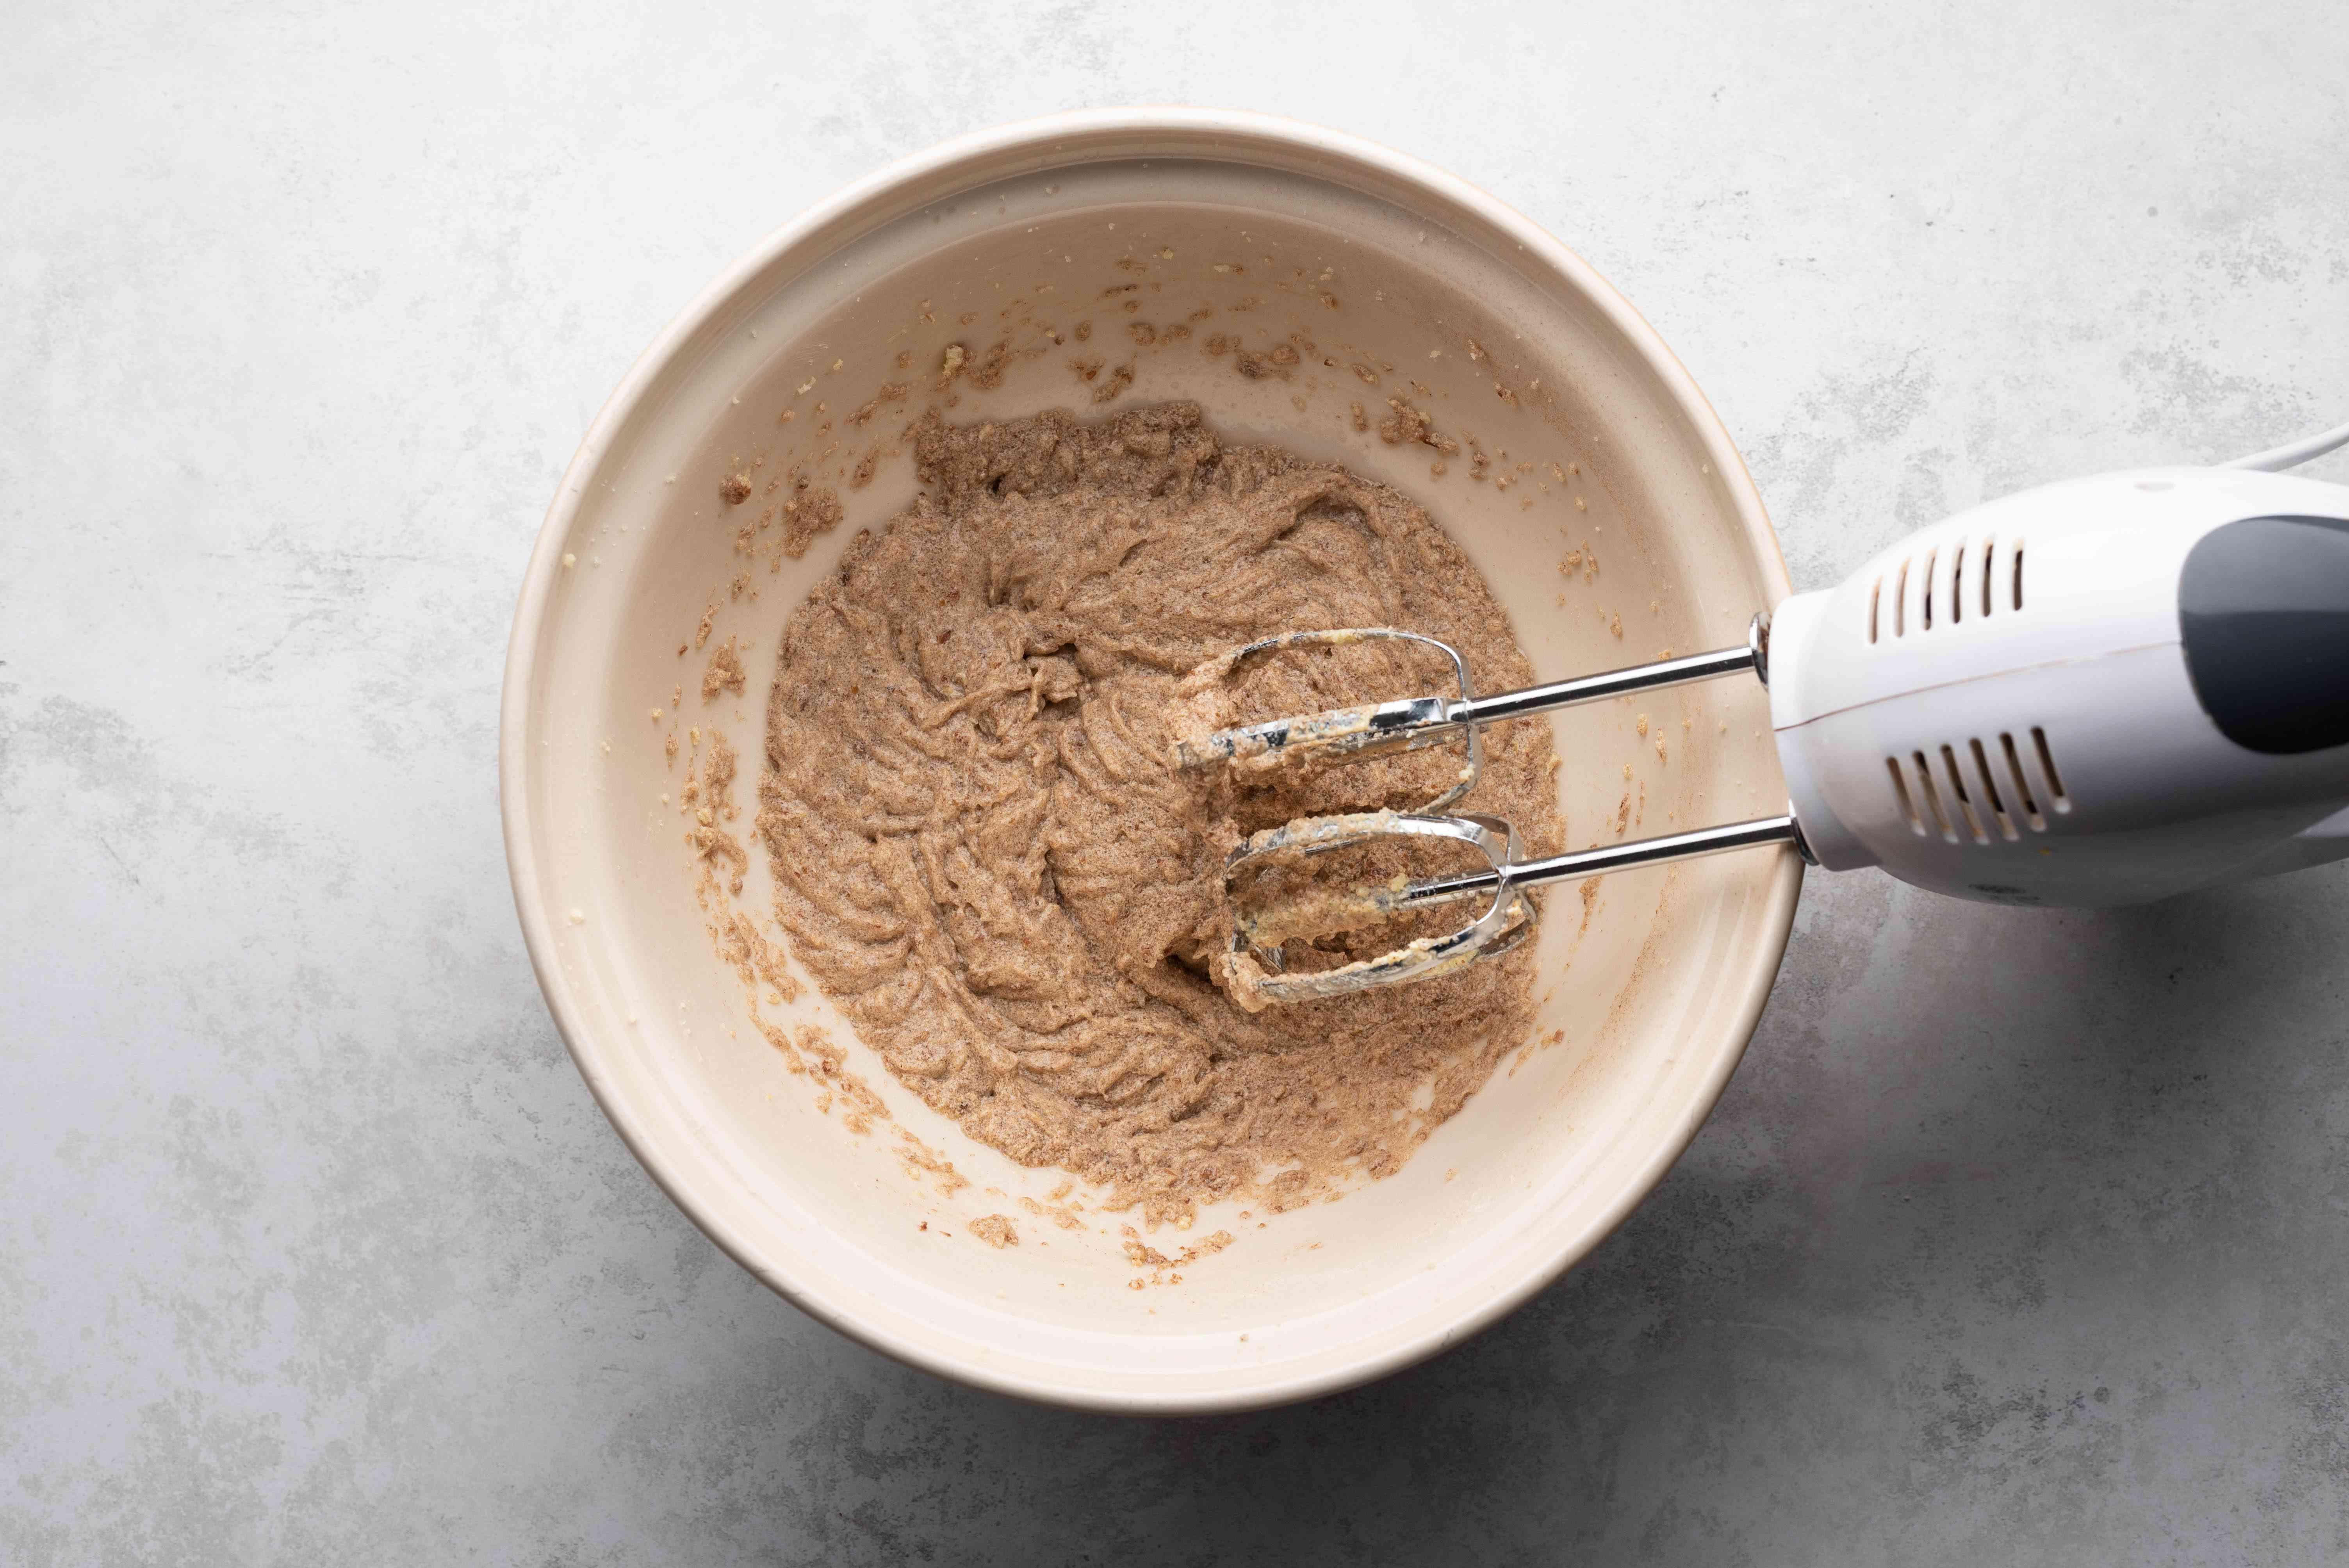 flaxseed meal, vanilla extract, salt, cinnamon, and baking powder in a bowl, hand mixer